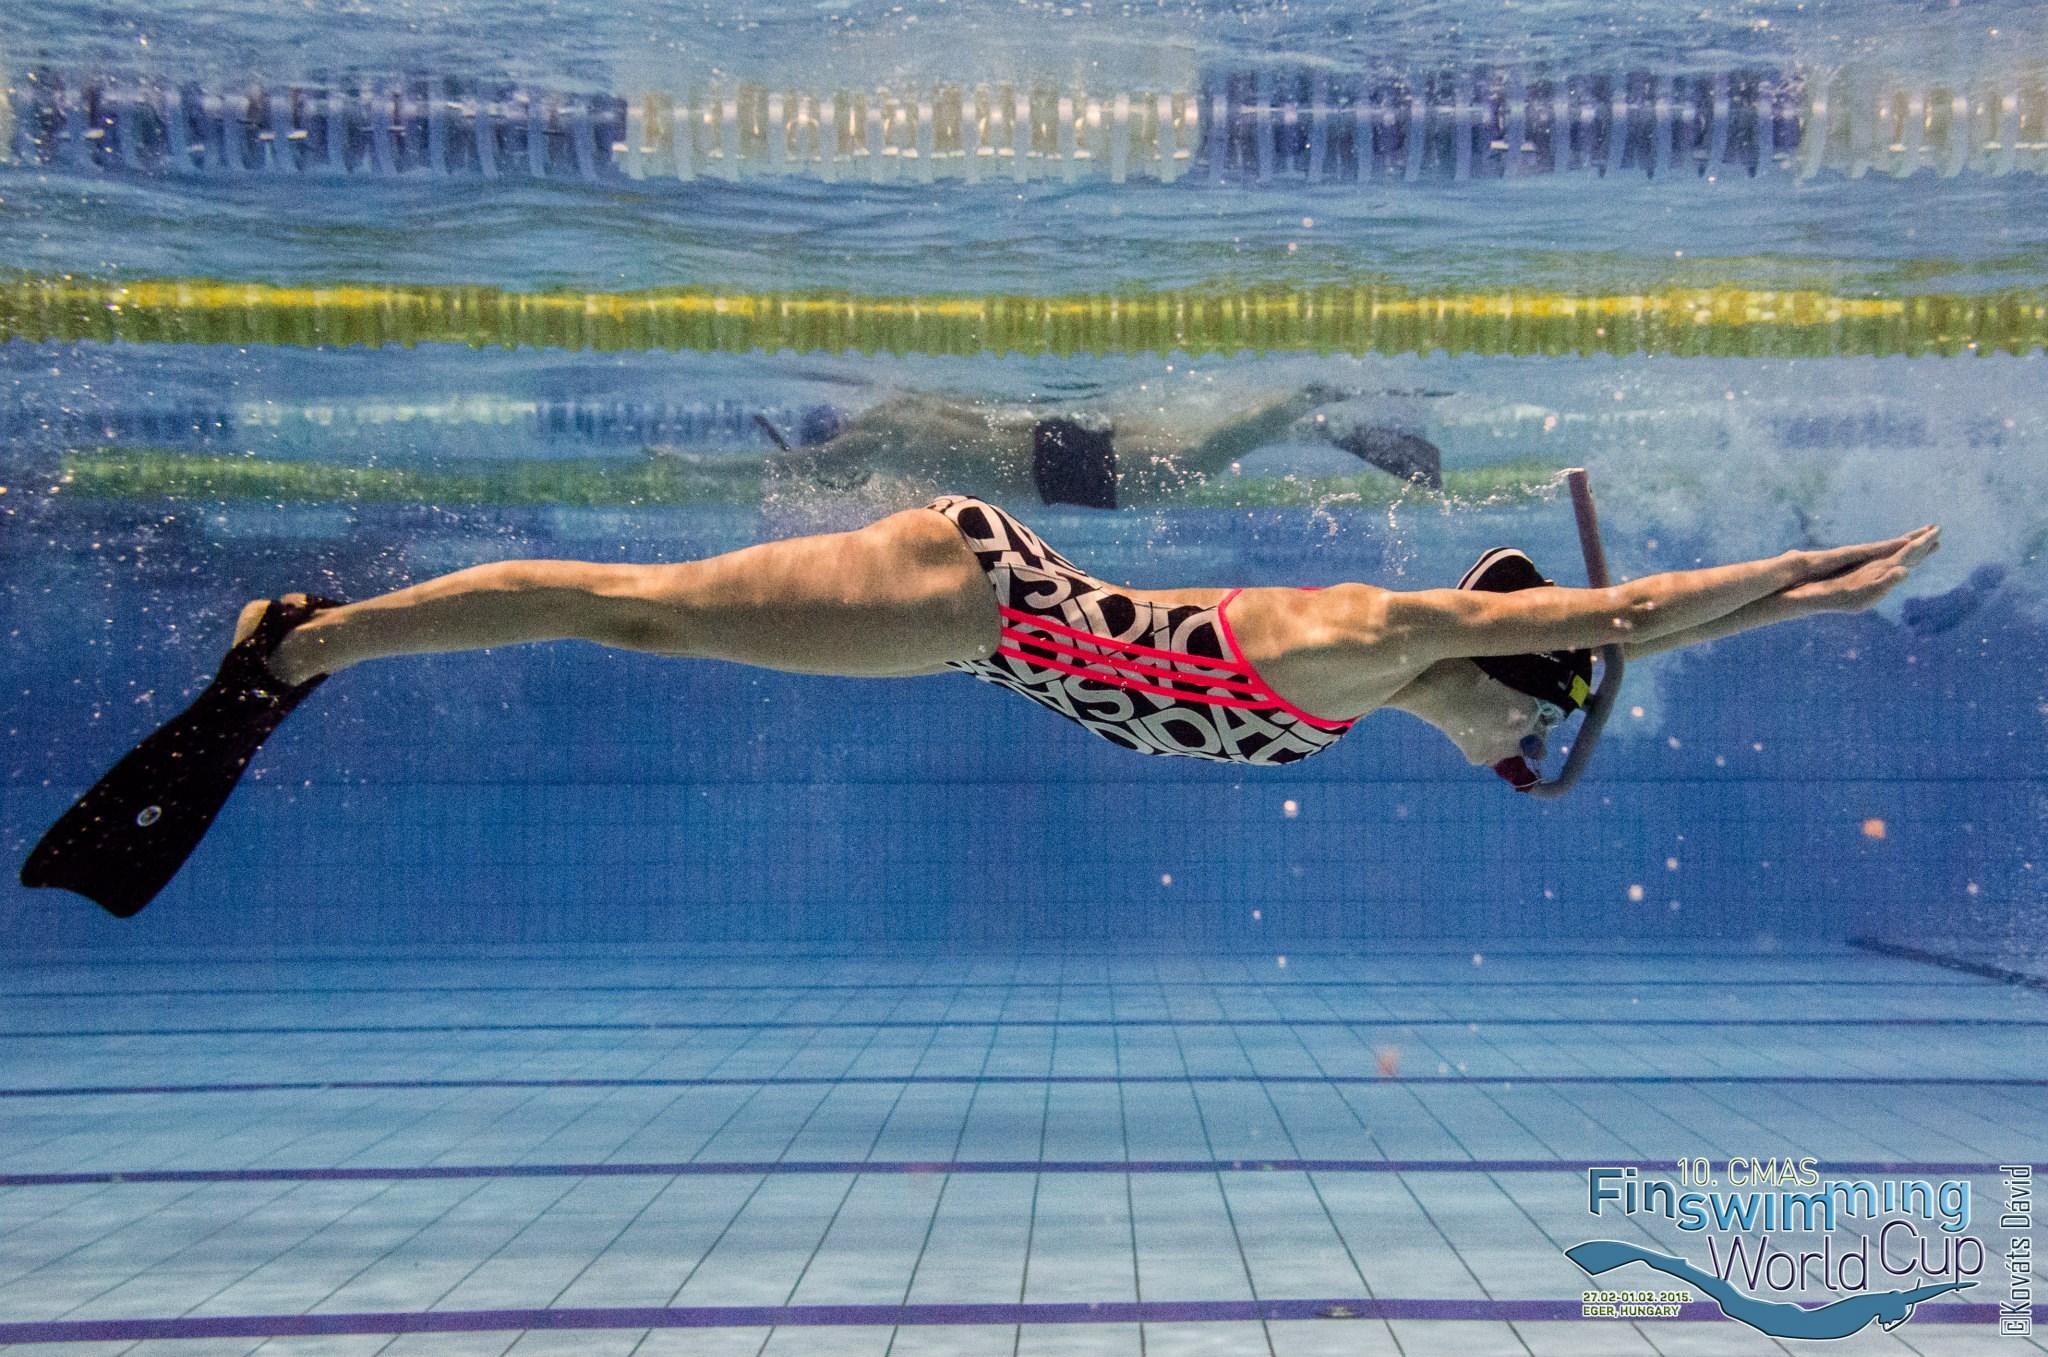 finswimminghungary